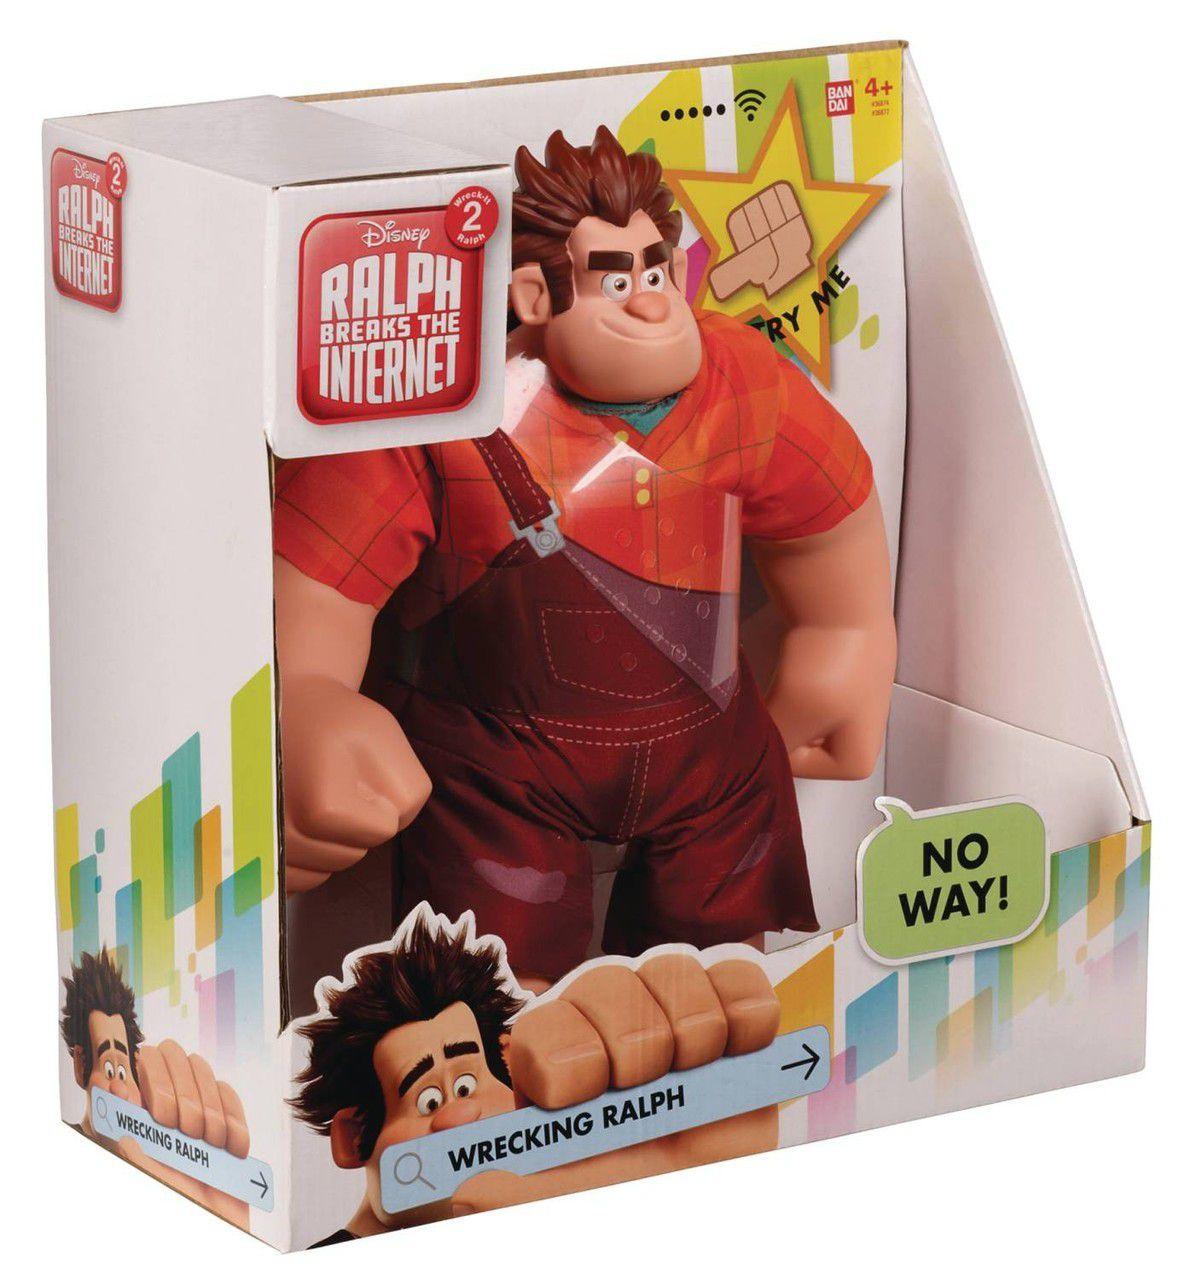 Boneco Detona Ralph (Wreck It Ralph): WiFi Ralph Quebrando a Internet (Ralph Breaks the Internet) Som e Movimento - Disney